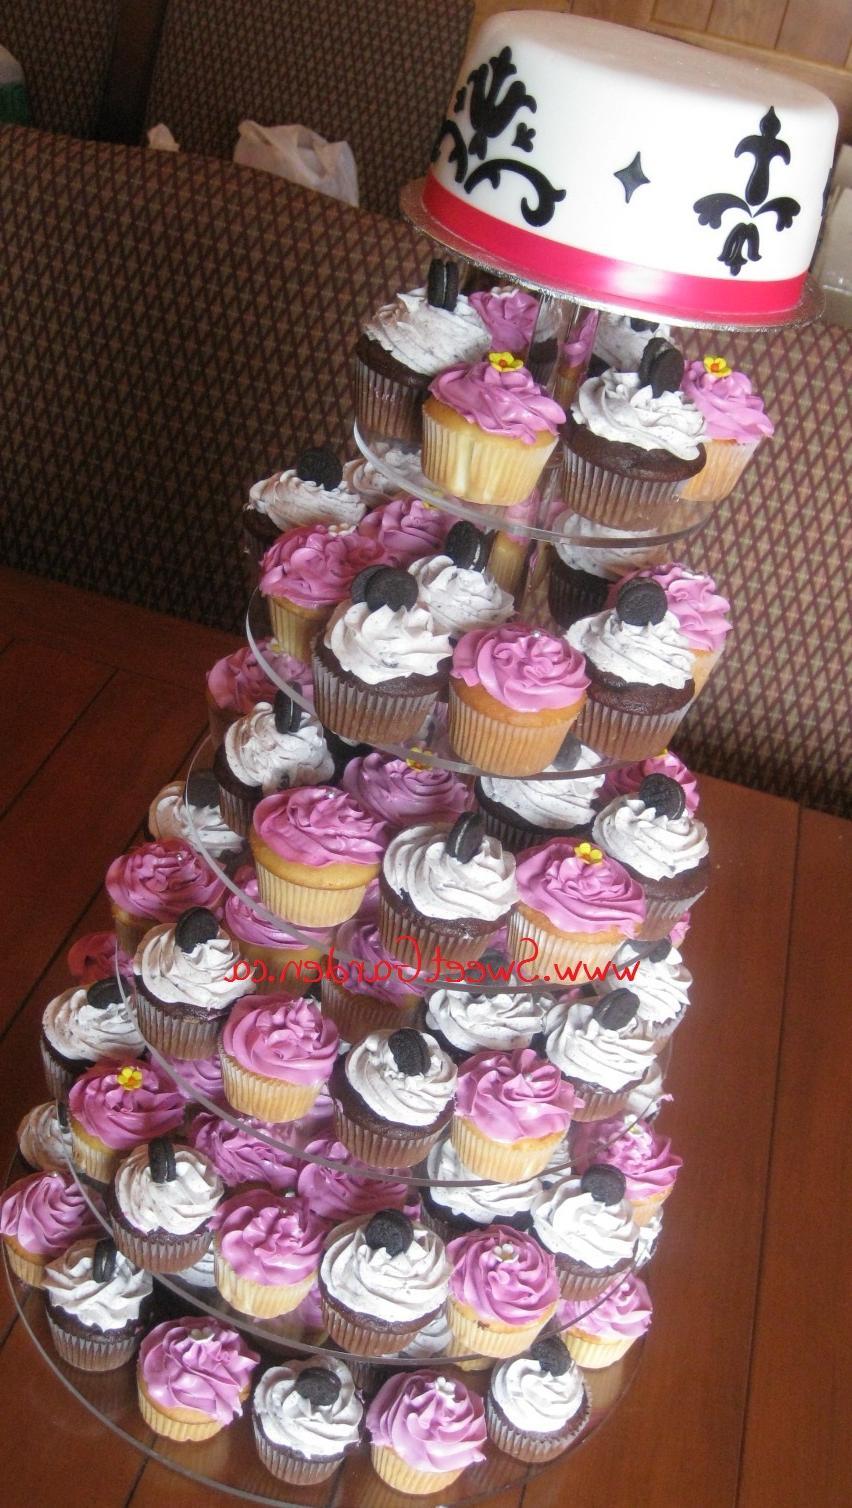 25 - Cupcake Tower